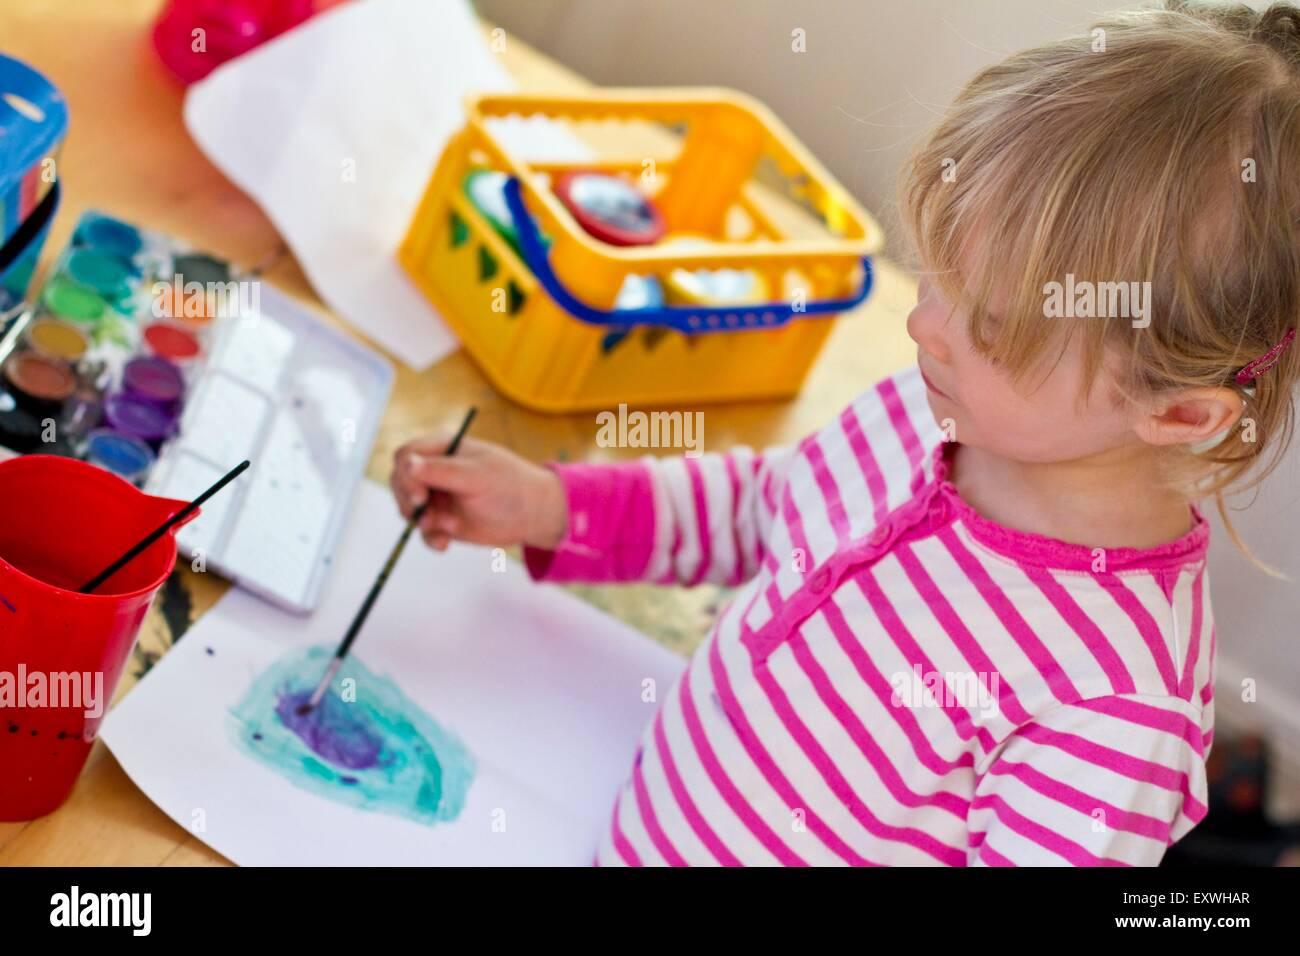 Childrens Paint Brushes Children Painting Stock Photos & Childrens ...